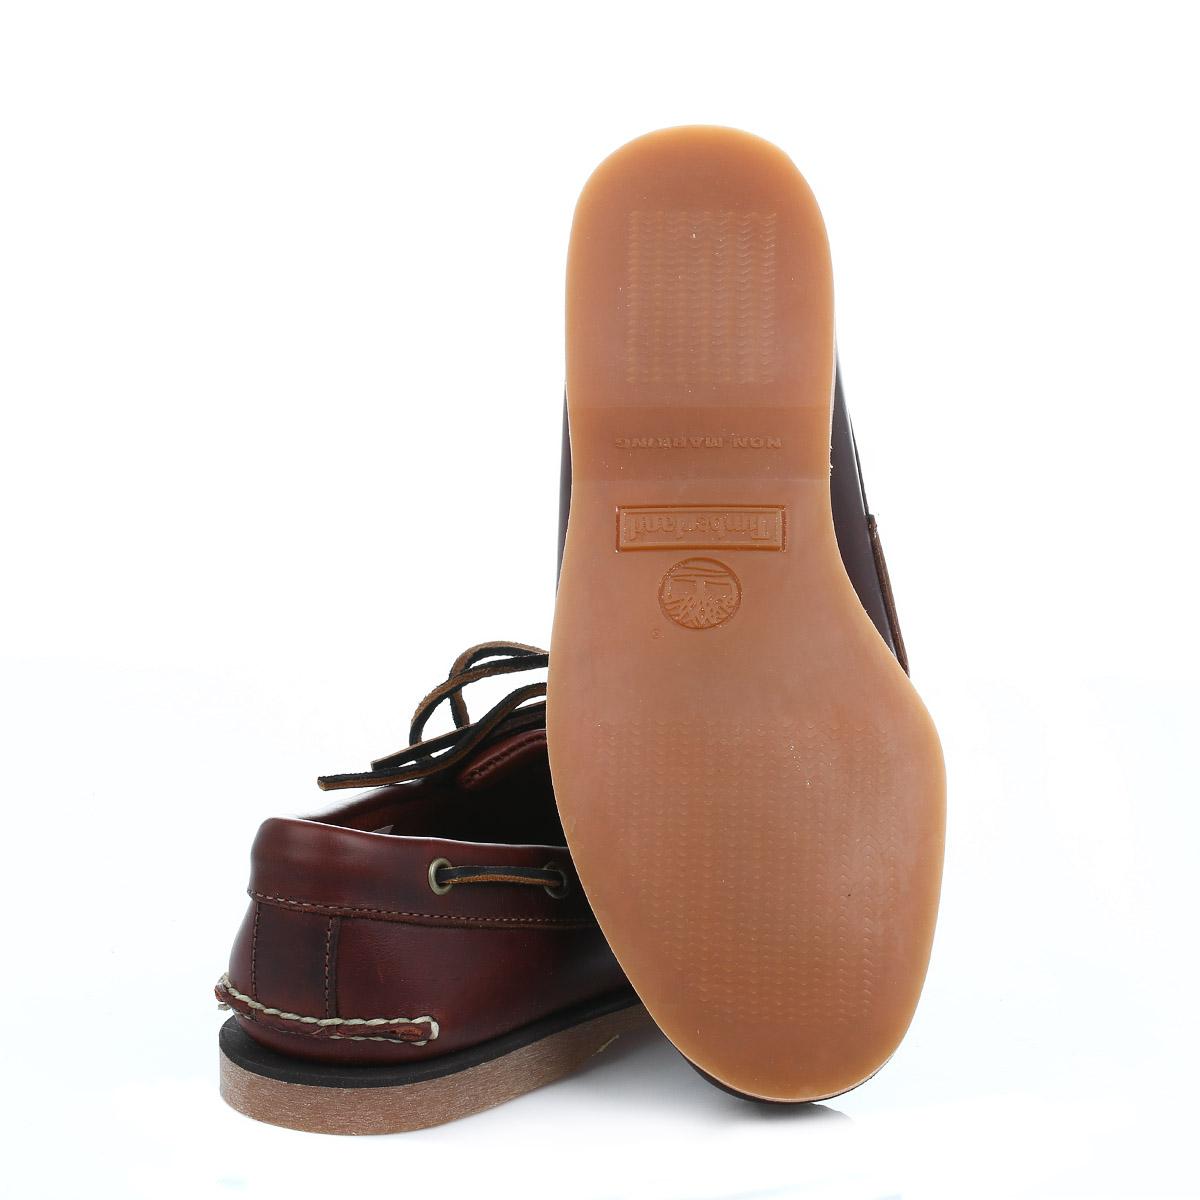 Mens Zapatos Del Barco Marrón Timberland uHrBbi